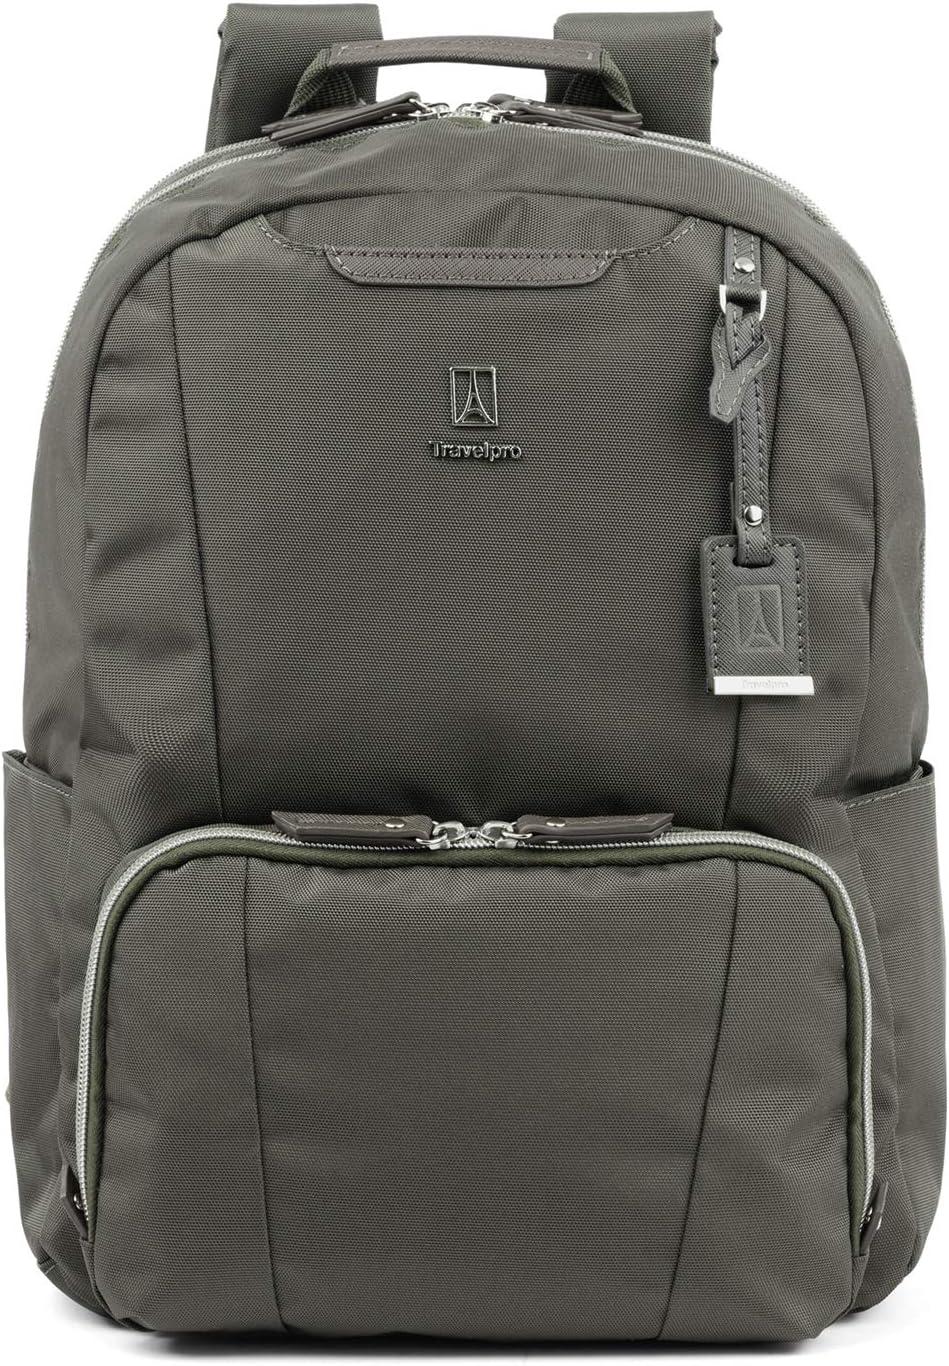 Travelpro Women's Maxlite 5-Laptop Backpack, Slate Green, One Size